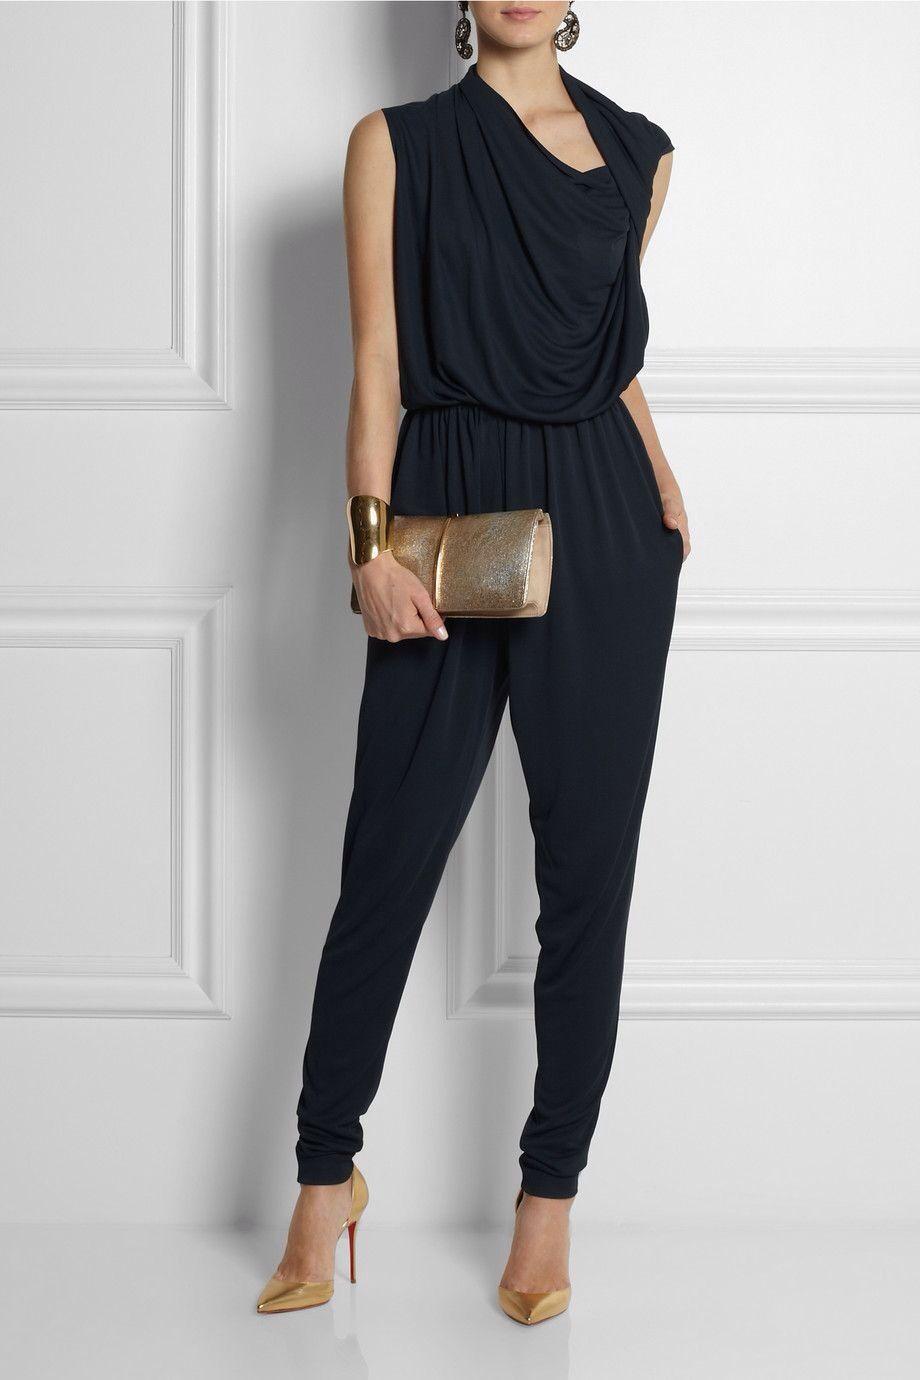 Pin by maria antoniadou on moda pinterest black jumpsuit